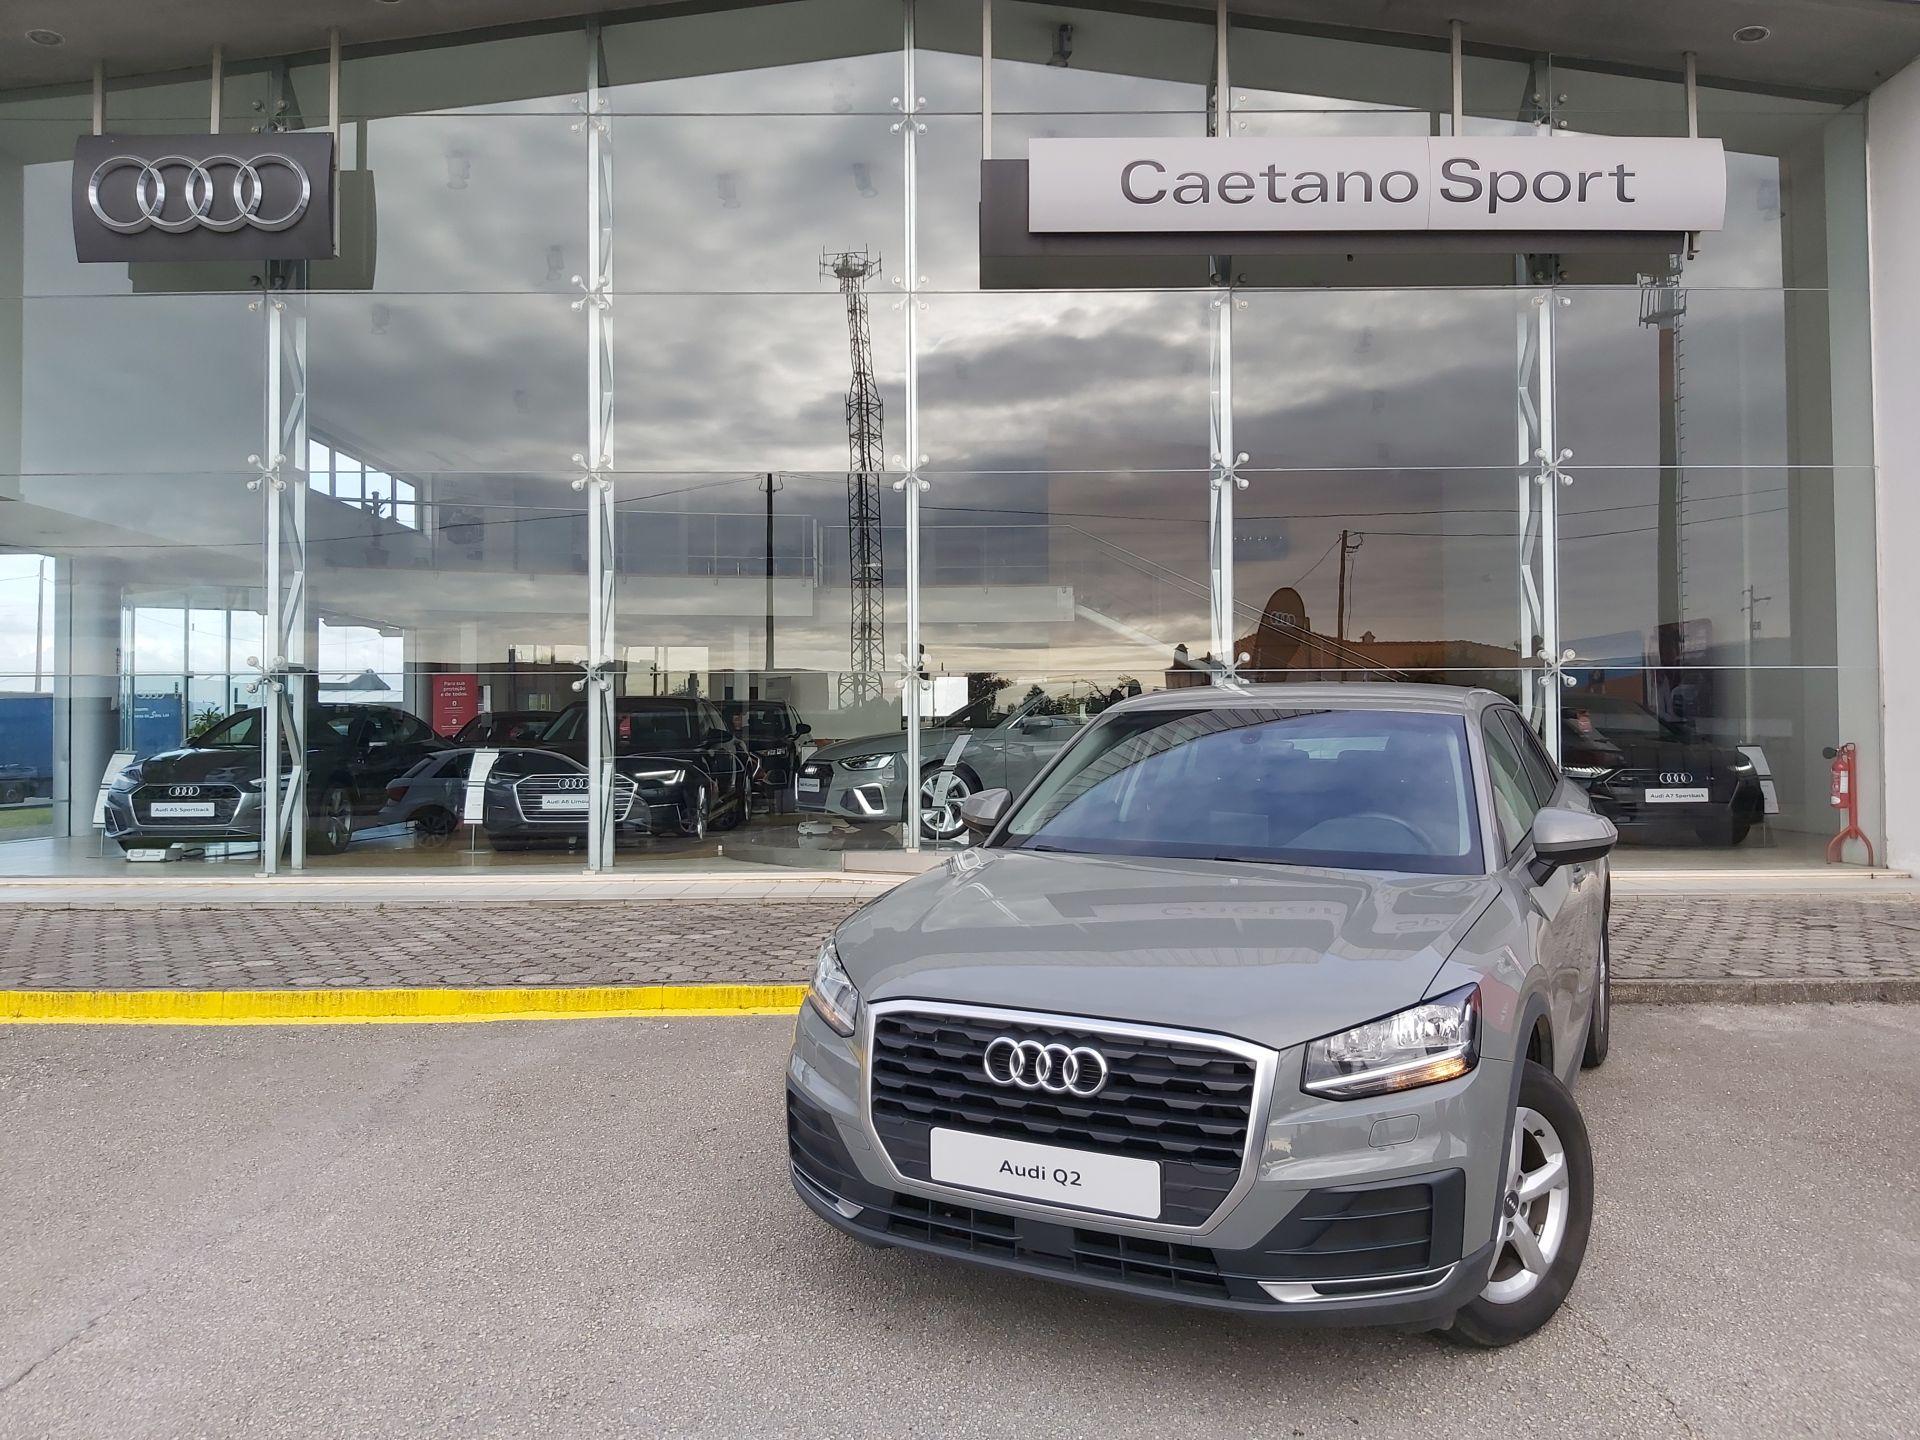 Audi Q2 1.0 TFSI ADVANCE usada Aveiro